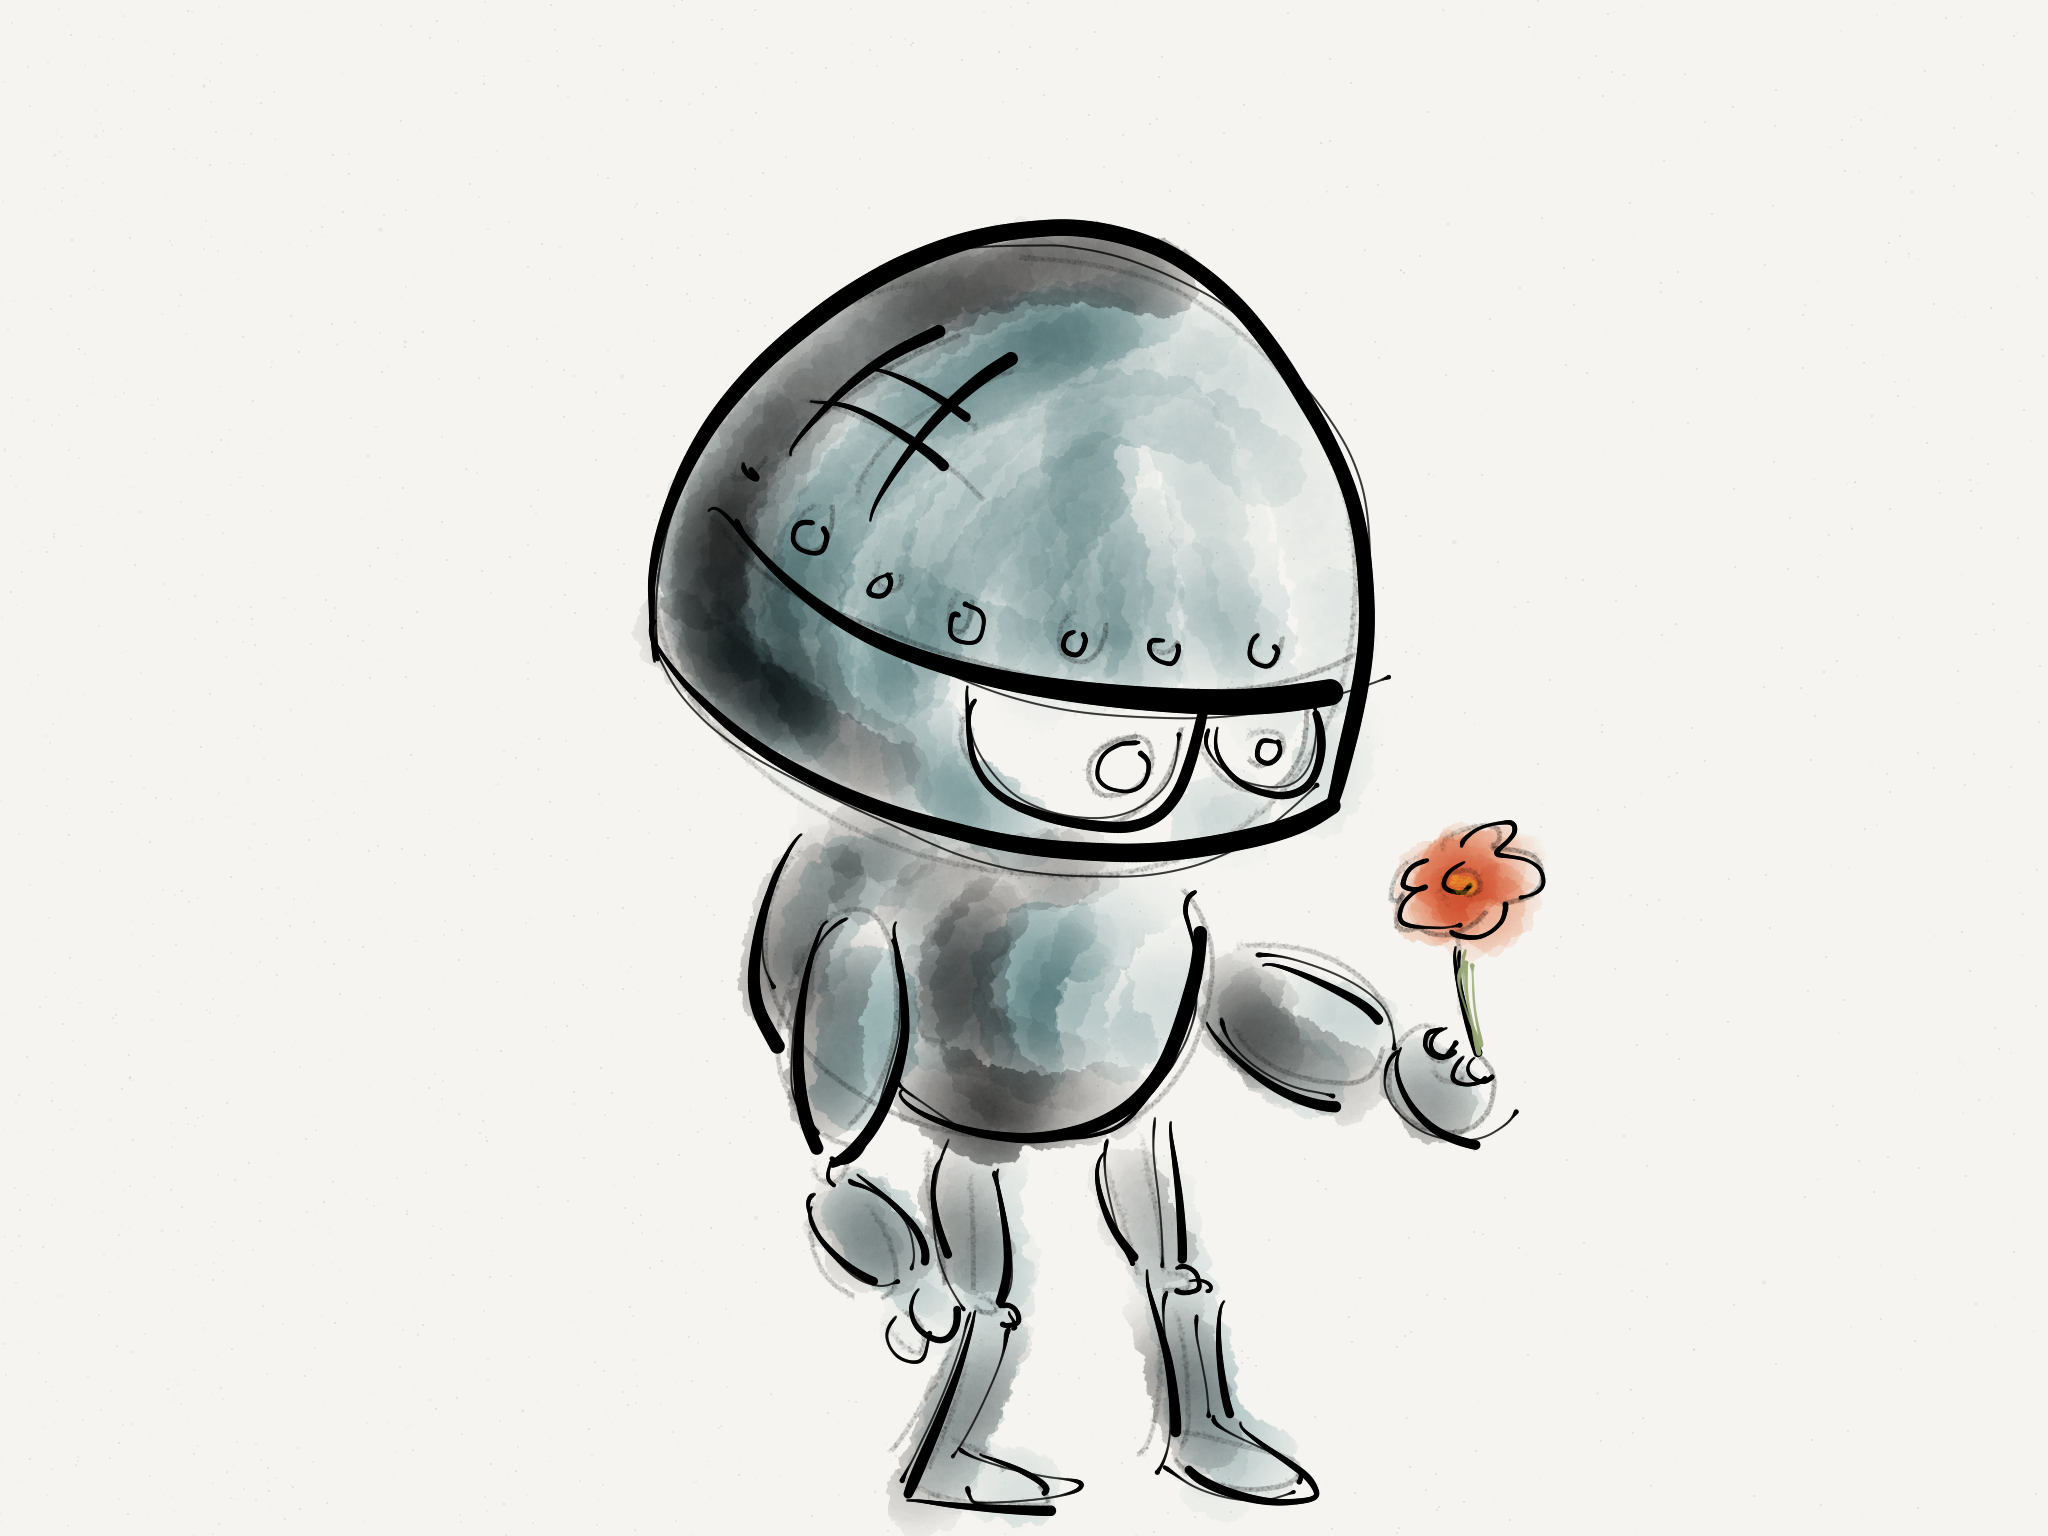 रोबोट, फूल, प्रौद्योगिकी, भविष्य, नवाचार - HD वॉलपेपर - प्रोफेसर-falken.com